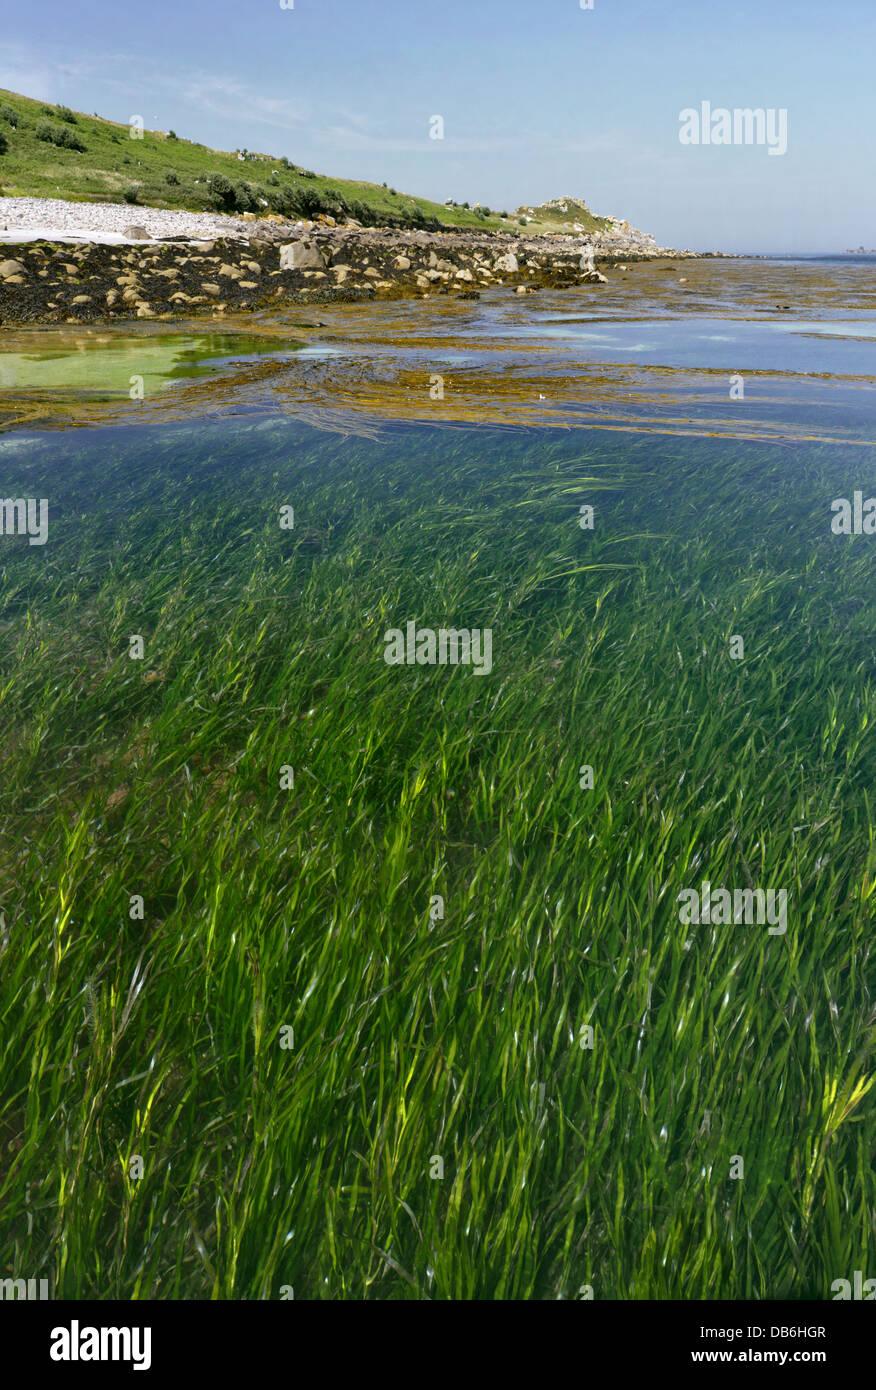 - Eelgrass Zostera marina. Cama Eelgrass, off St Helen's, Isles of Scilly. Imagen De Stock